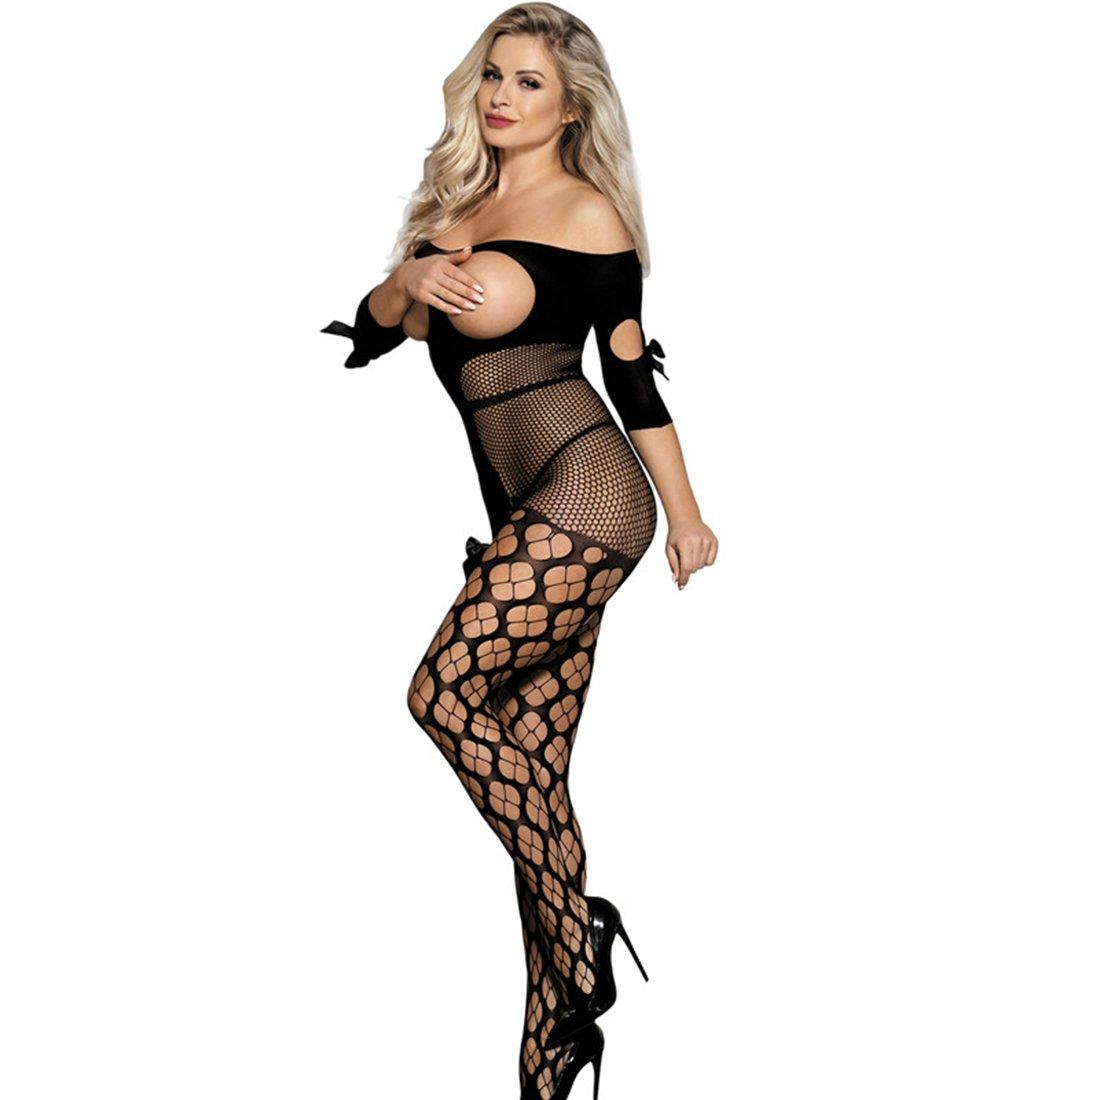 46c6fcea12 Amazon.com  HI JANE Sexy Lingerie Black Fishnet Bodystocking Cupless  Crotchless Bodysuit Plus Size  Clothing